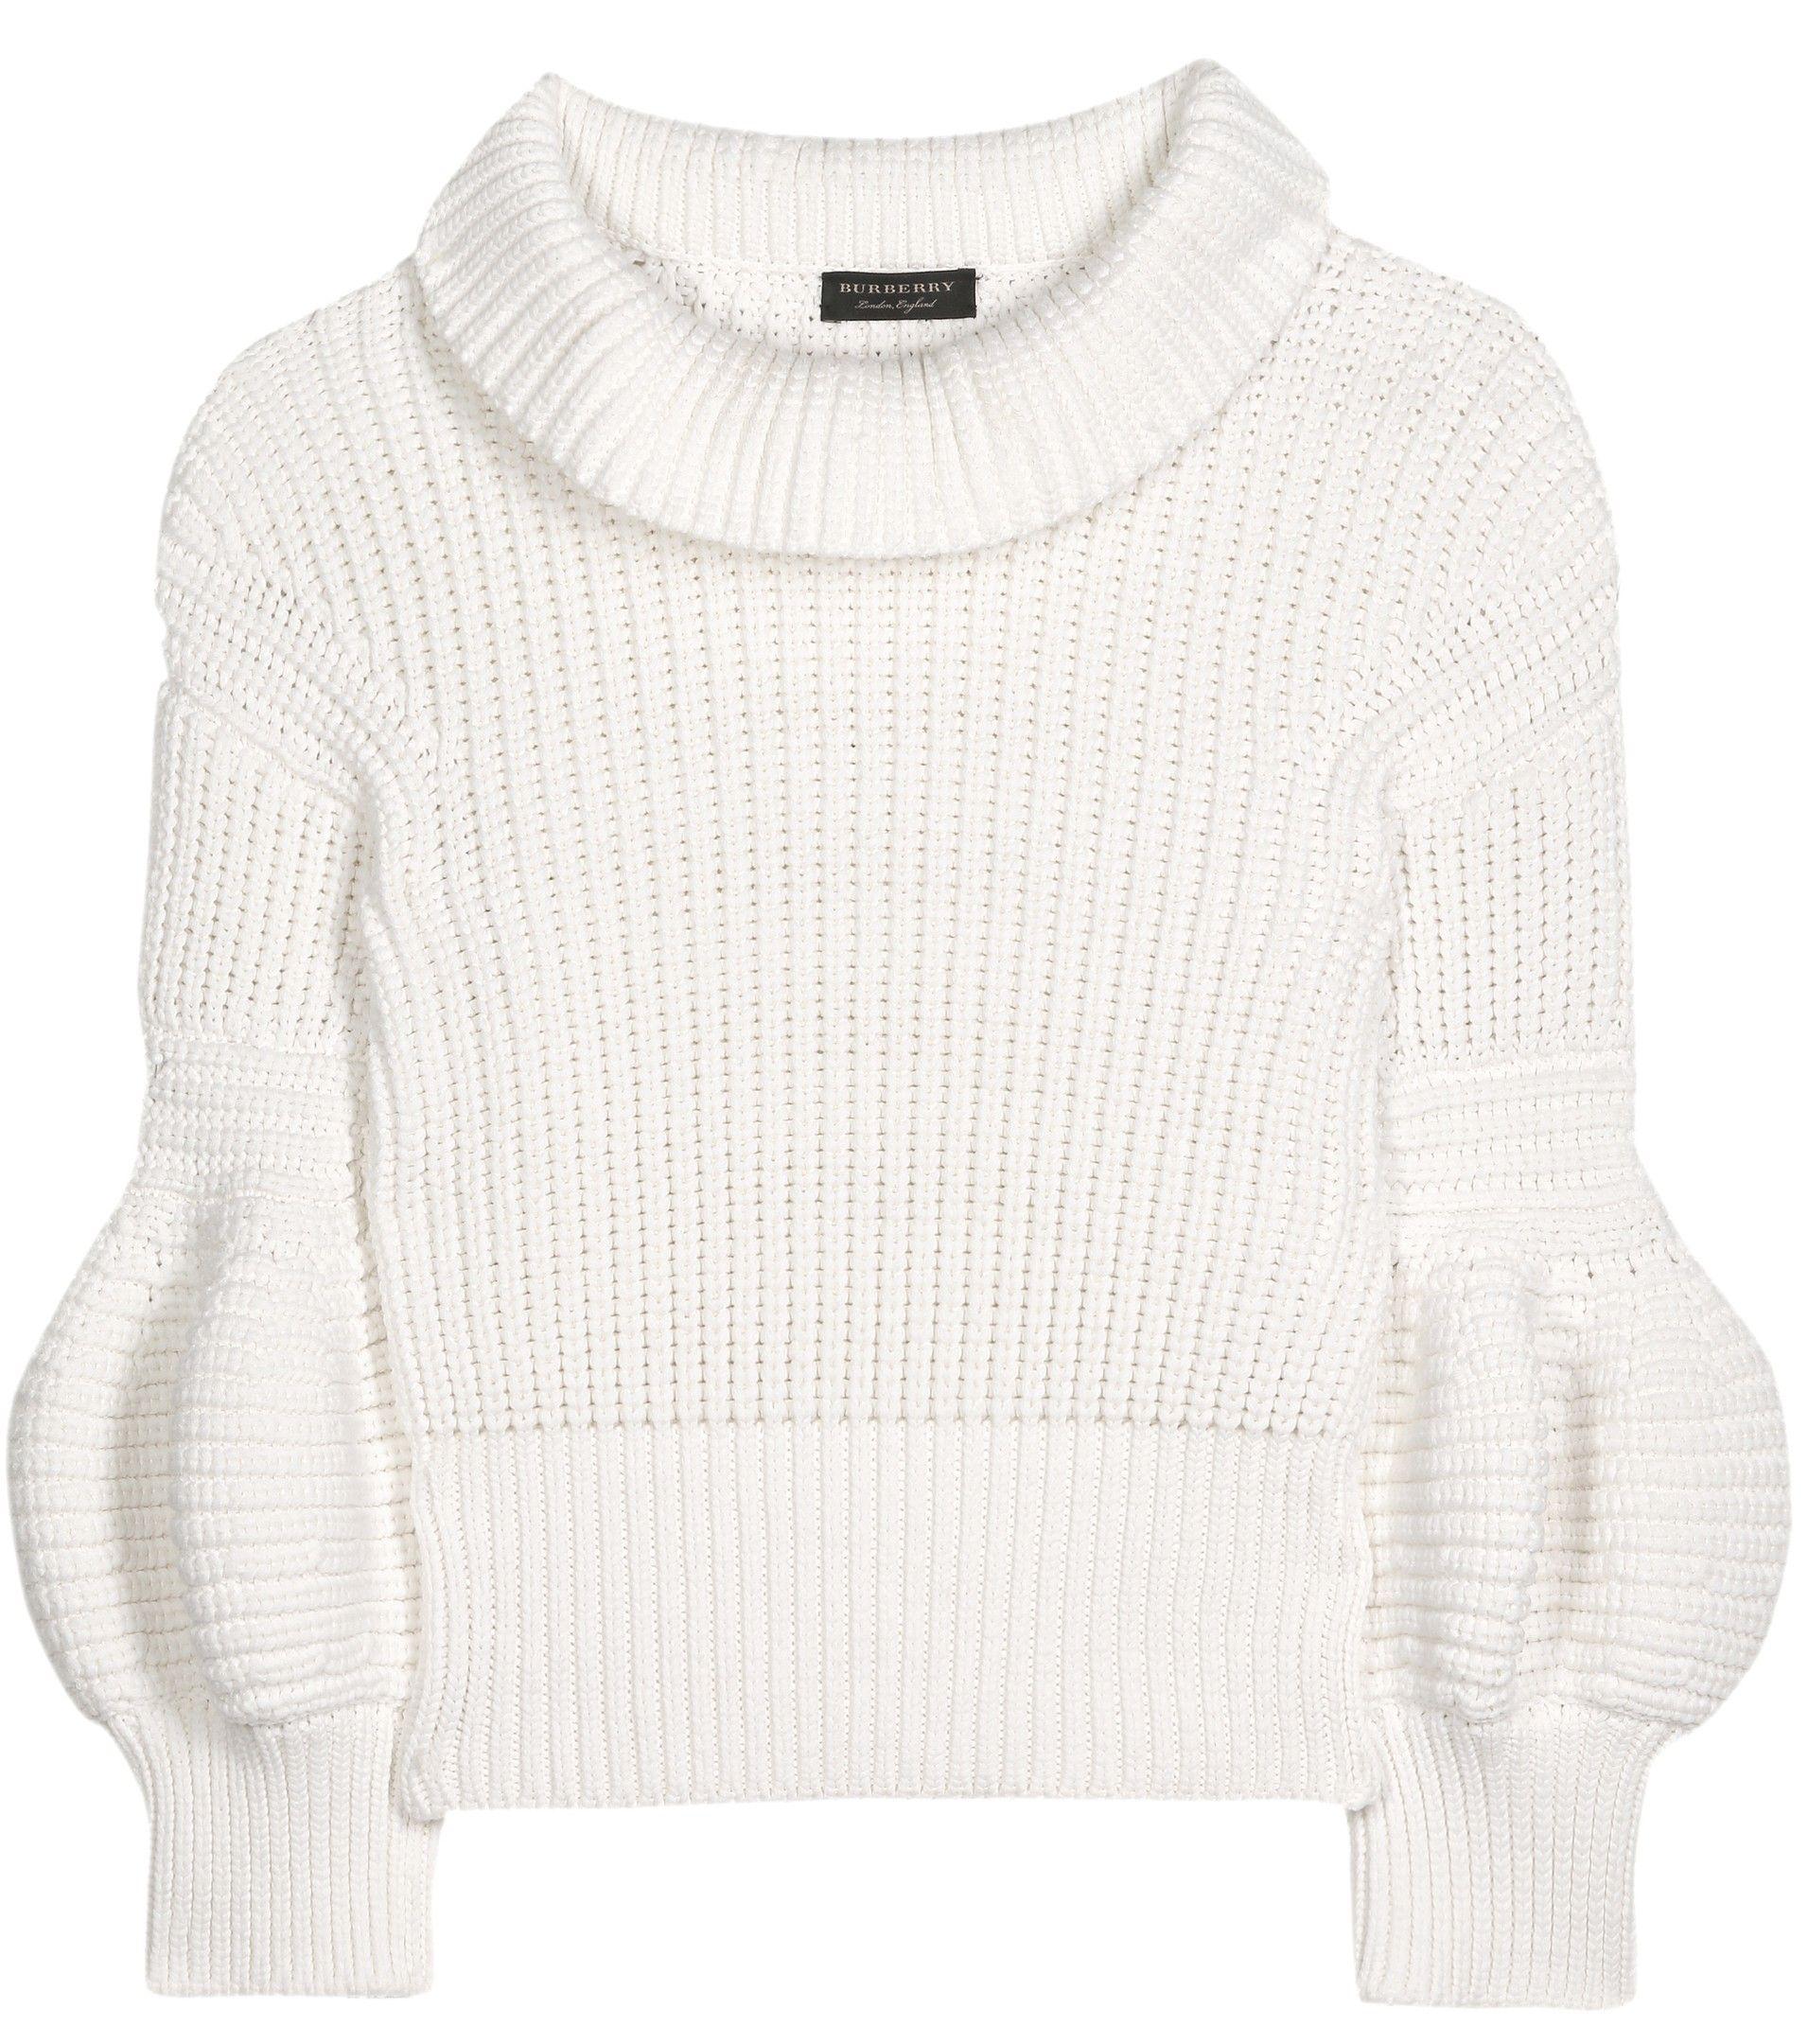 mytheresa.com - Cotton-blend sweater - Tuesday - Current week ...